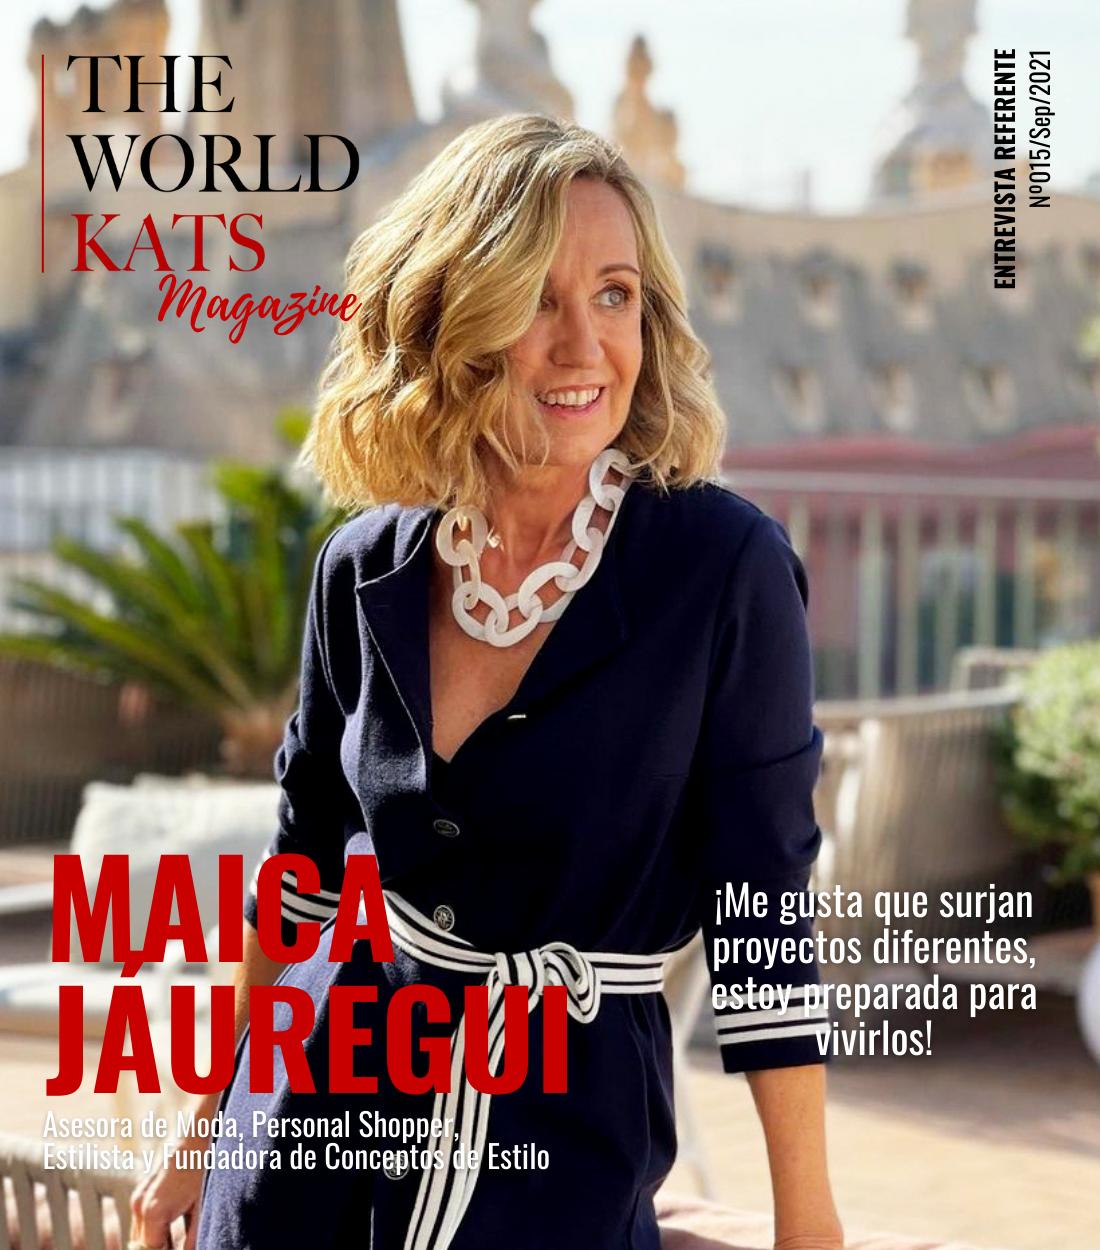 Maica Jáuregui, asesora de moda, personal shopper, entrevista